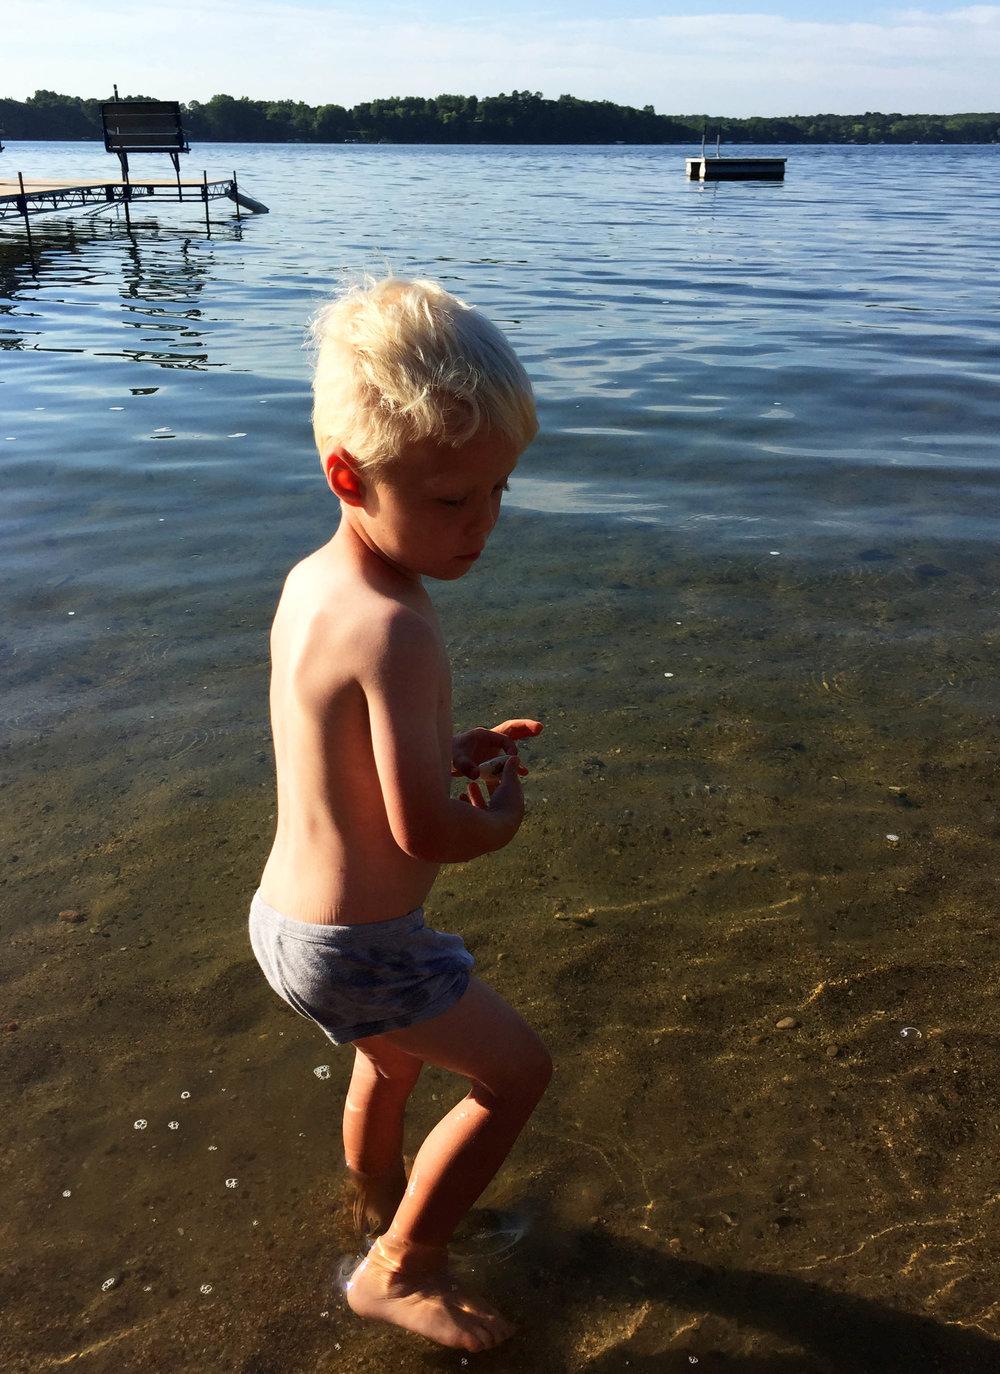 2017 07 15 Caden Lake 01.jpg